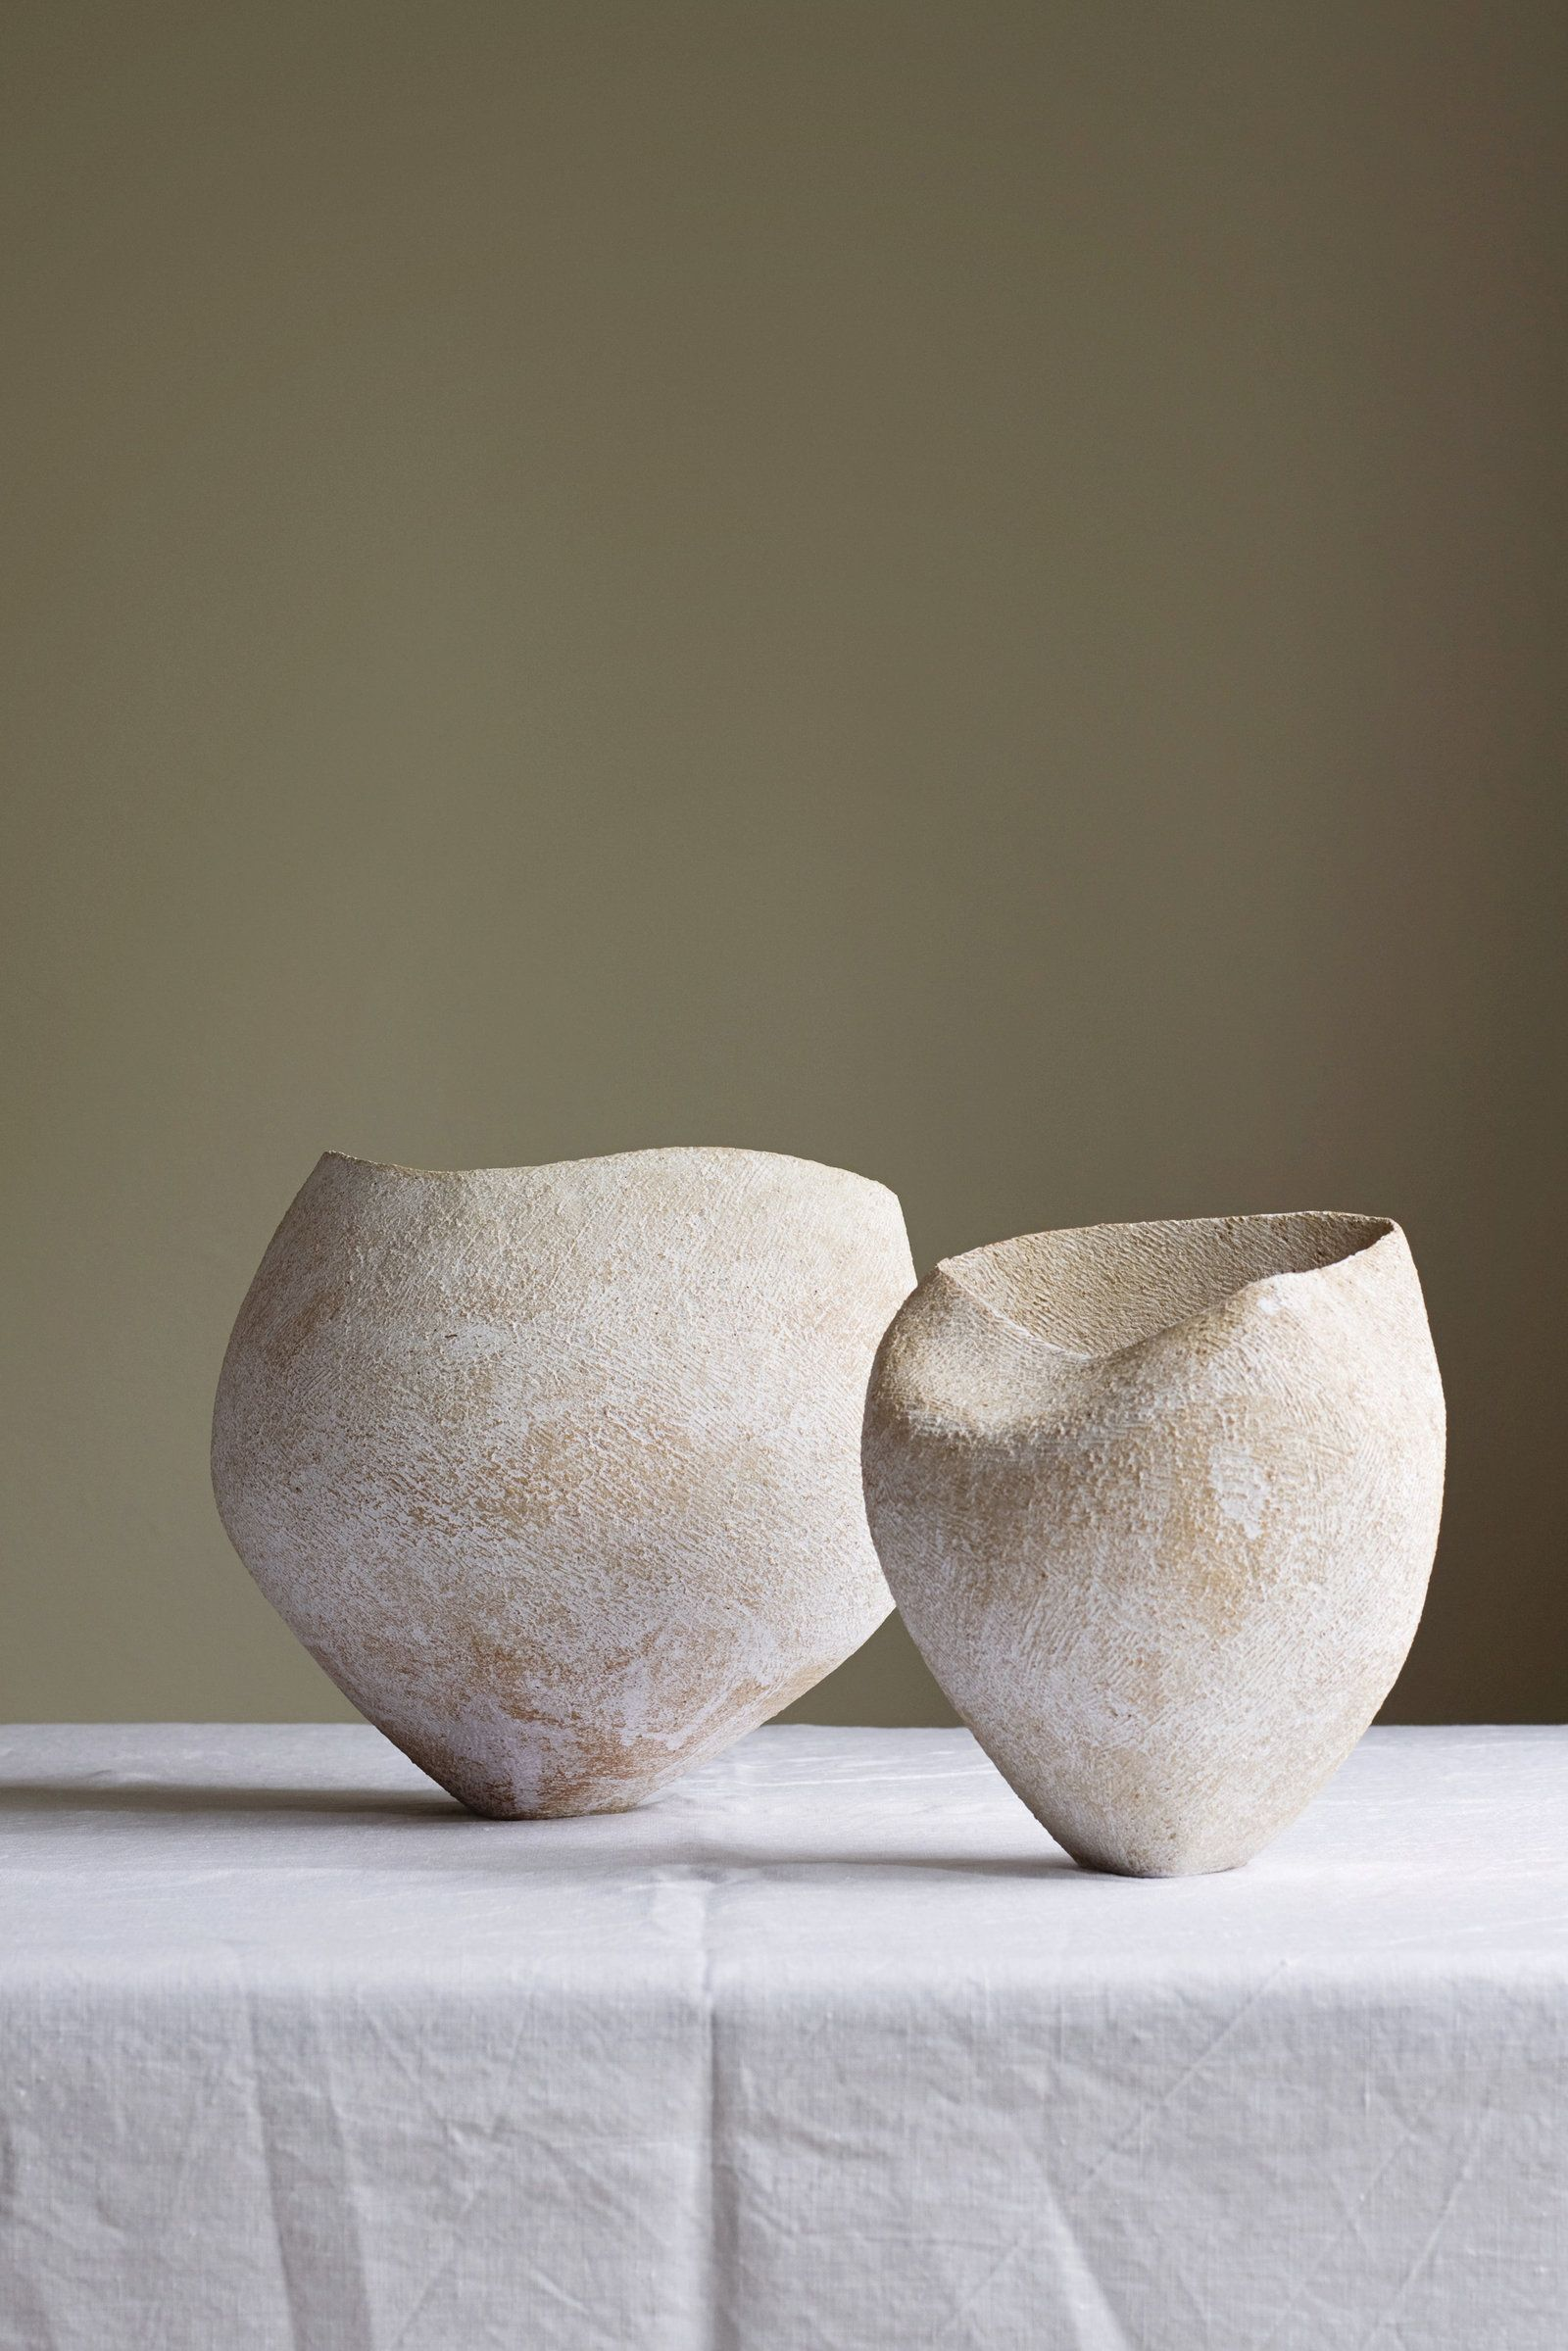 Pin By Suzonne Stirling On Keramiikka Ceramic Artists Ceramic Vessel Pottery Sculpture